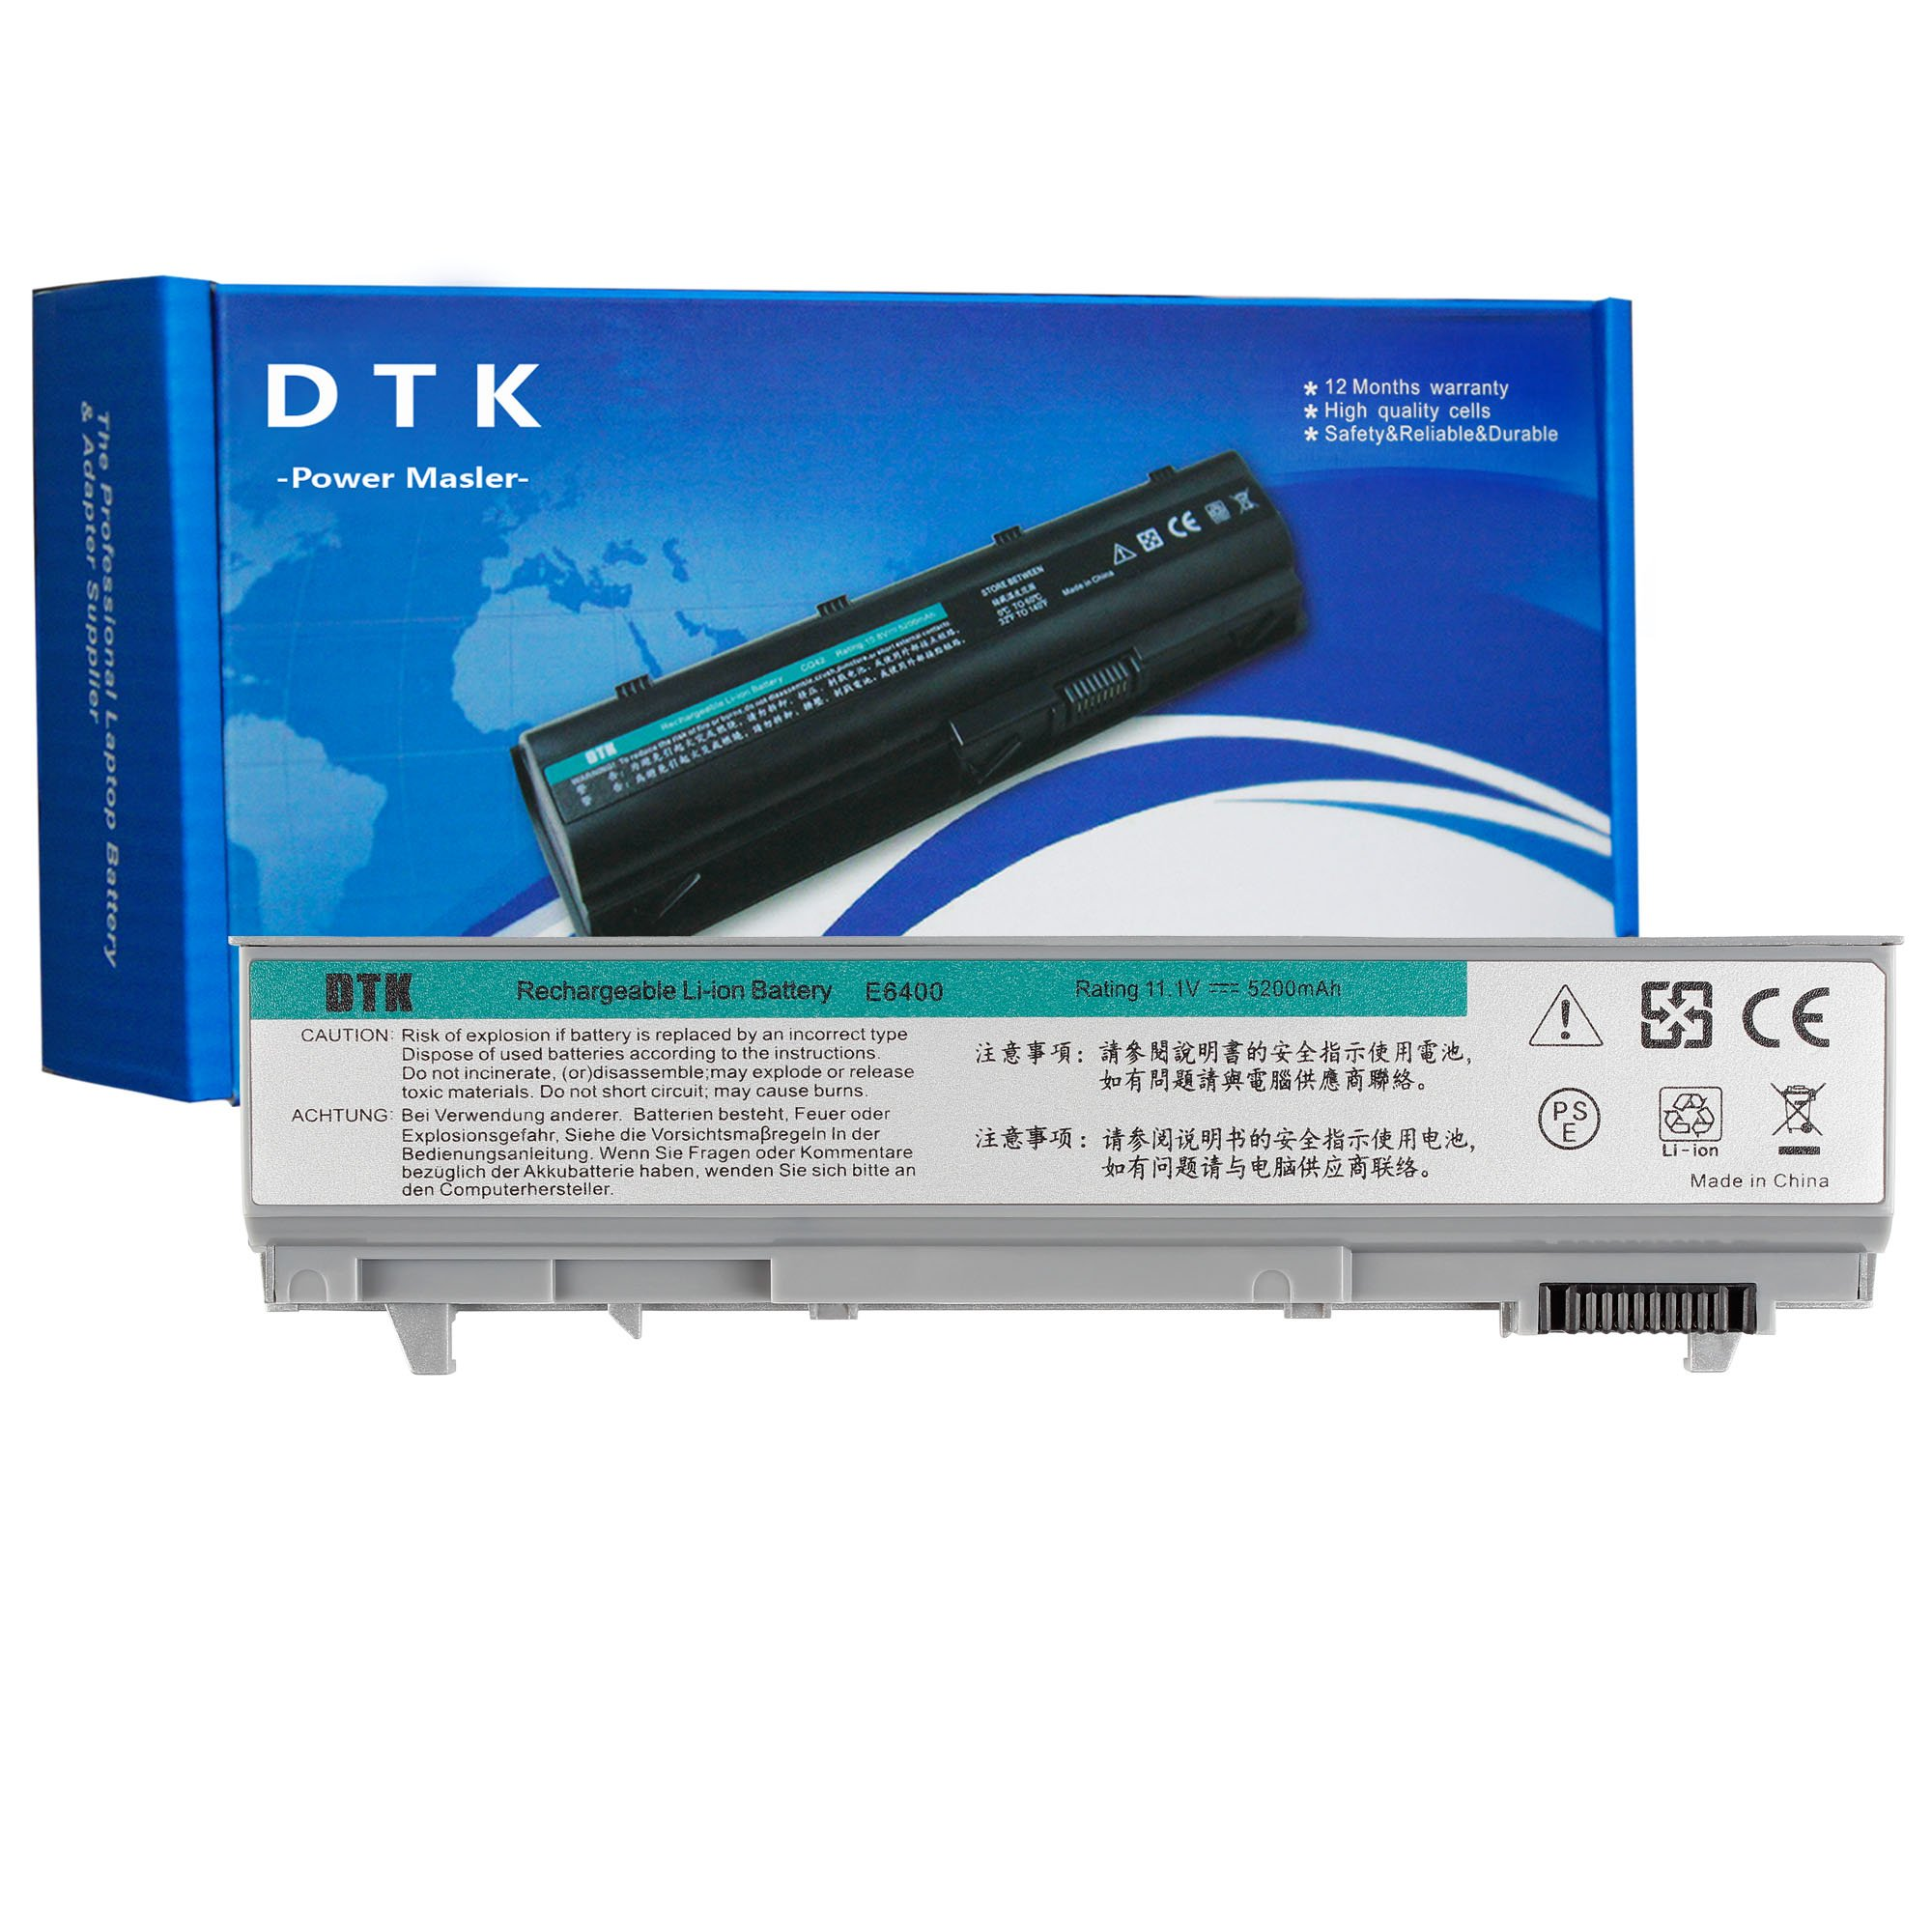 Dtk New Laptop Notebook Battery Replacement for Dell Computer Latitude E6400 E6410 E6500 E6510 Precision M2400 M4400 M4500 6-cell